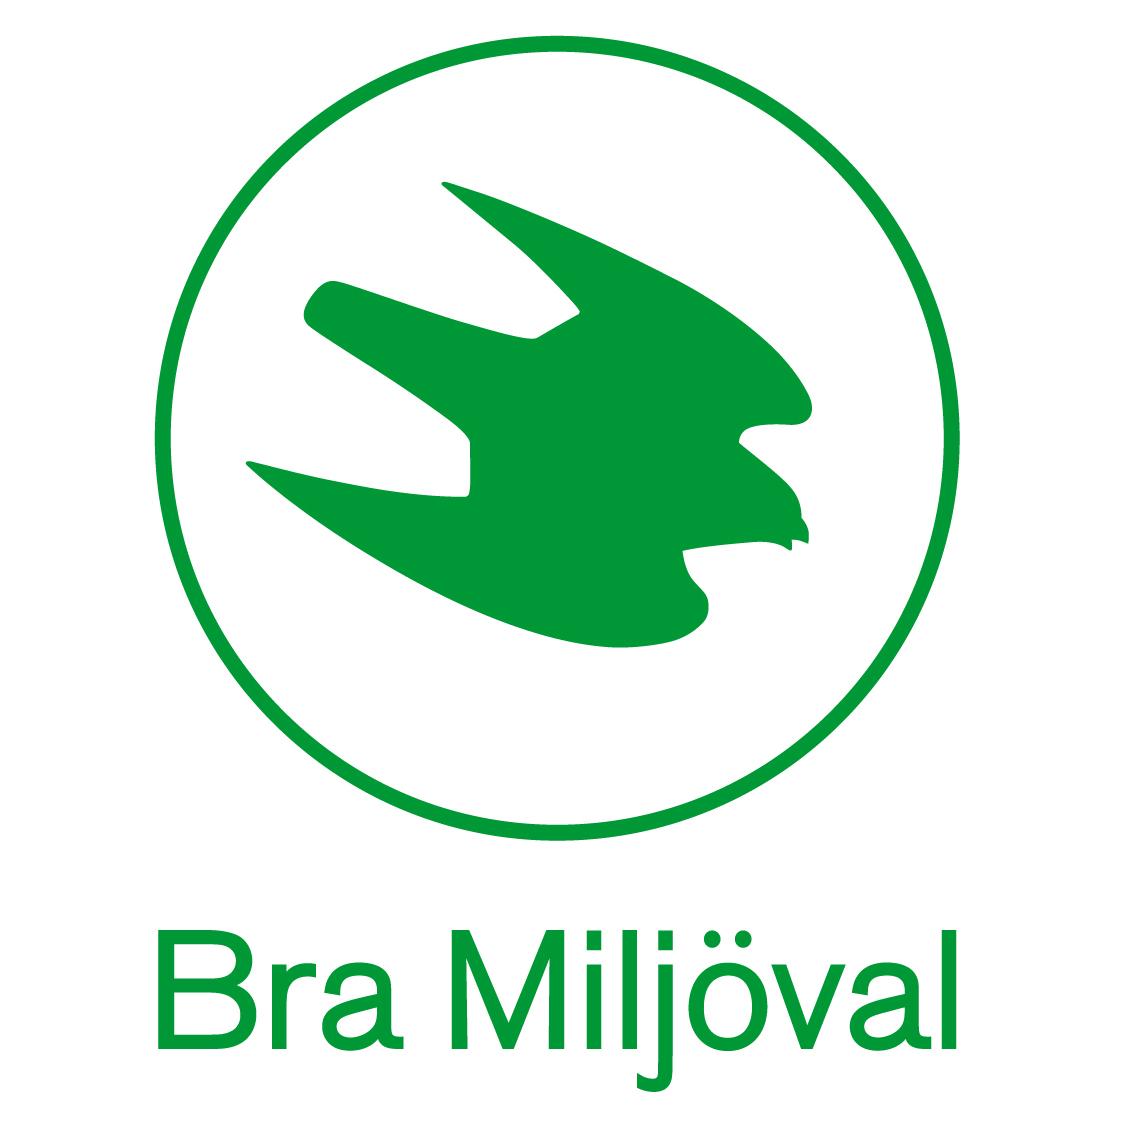 logotyp, logga, logo, grön, bramiljöval